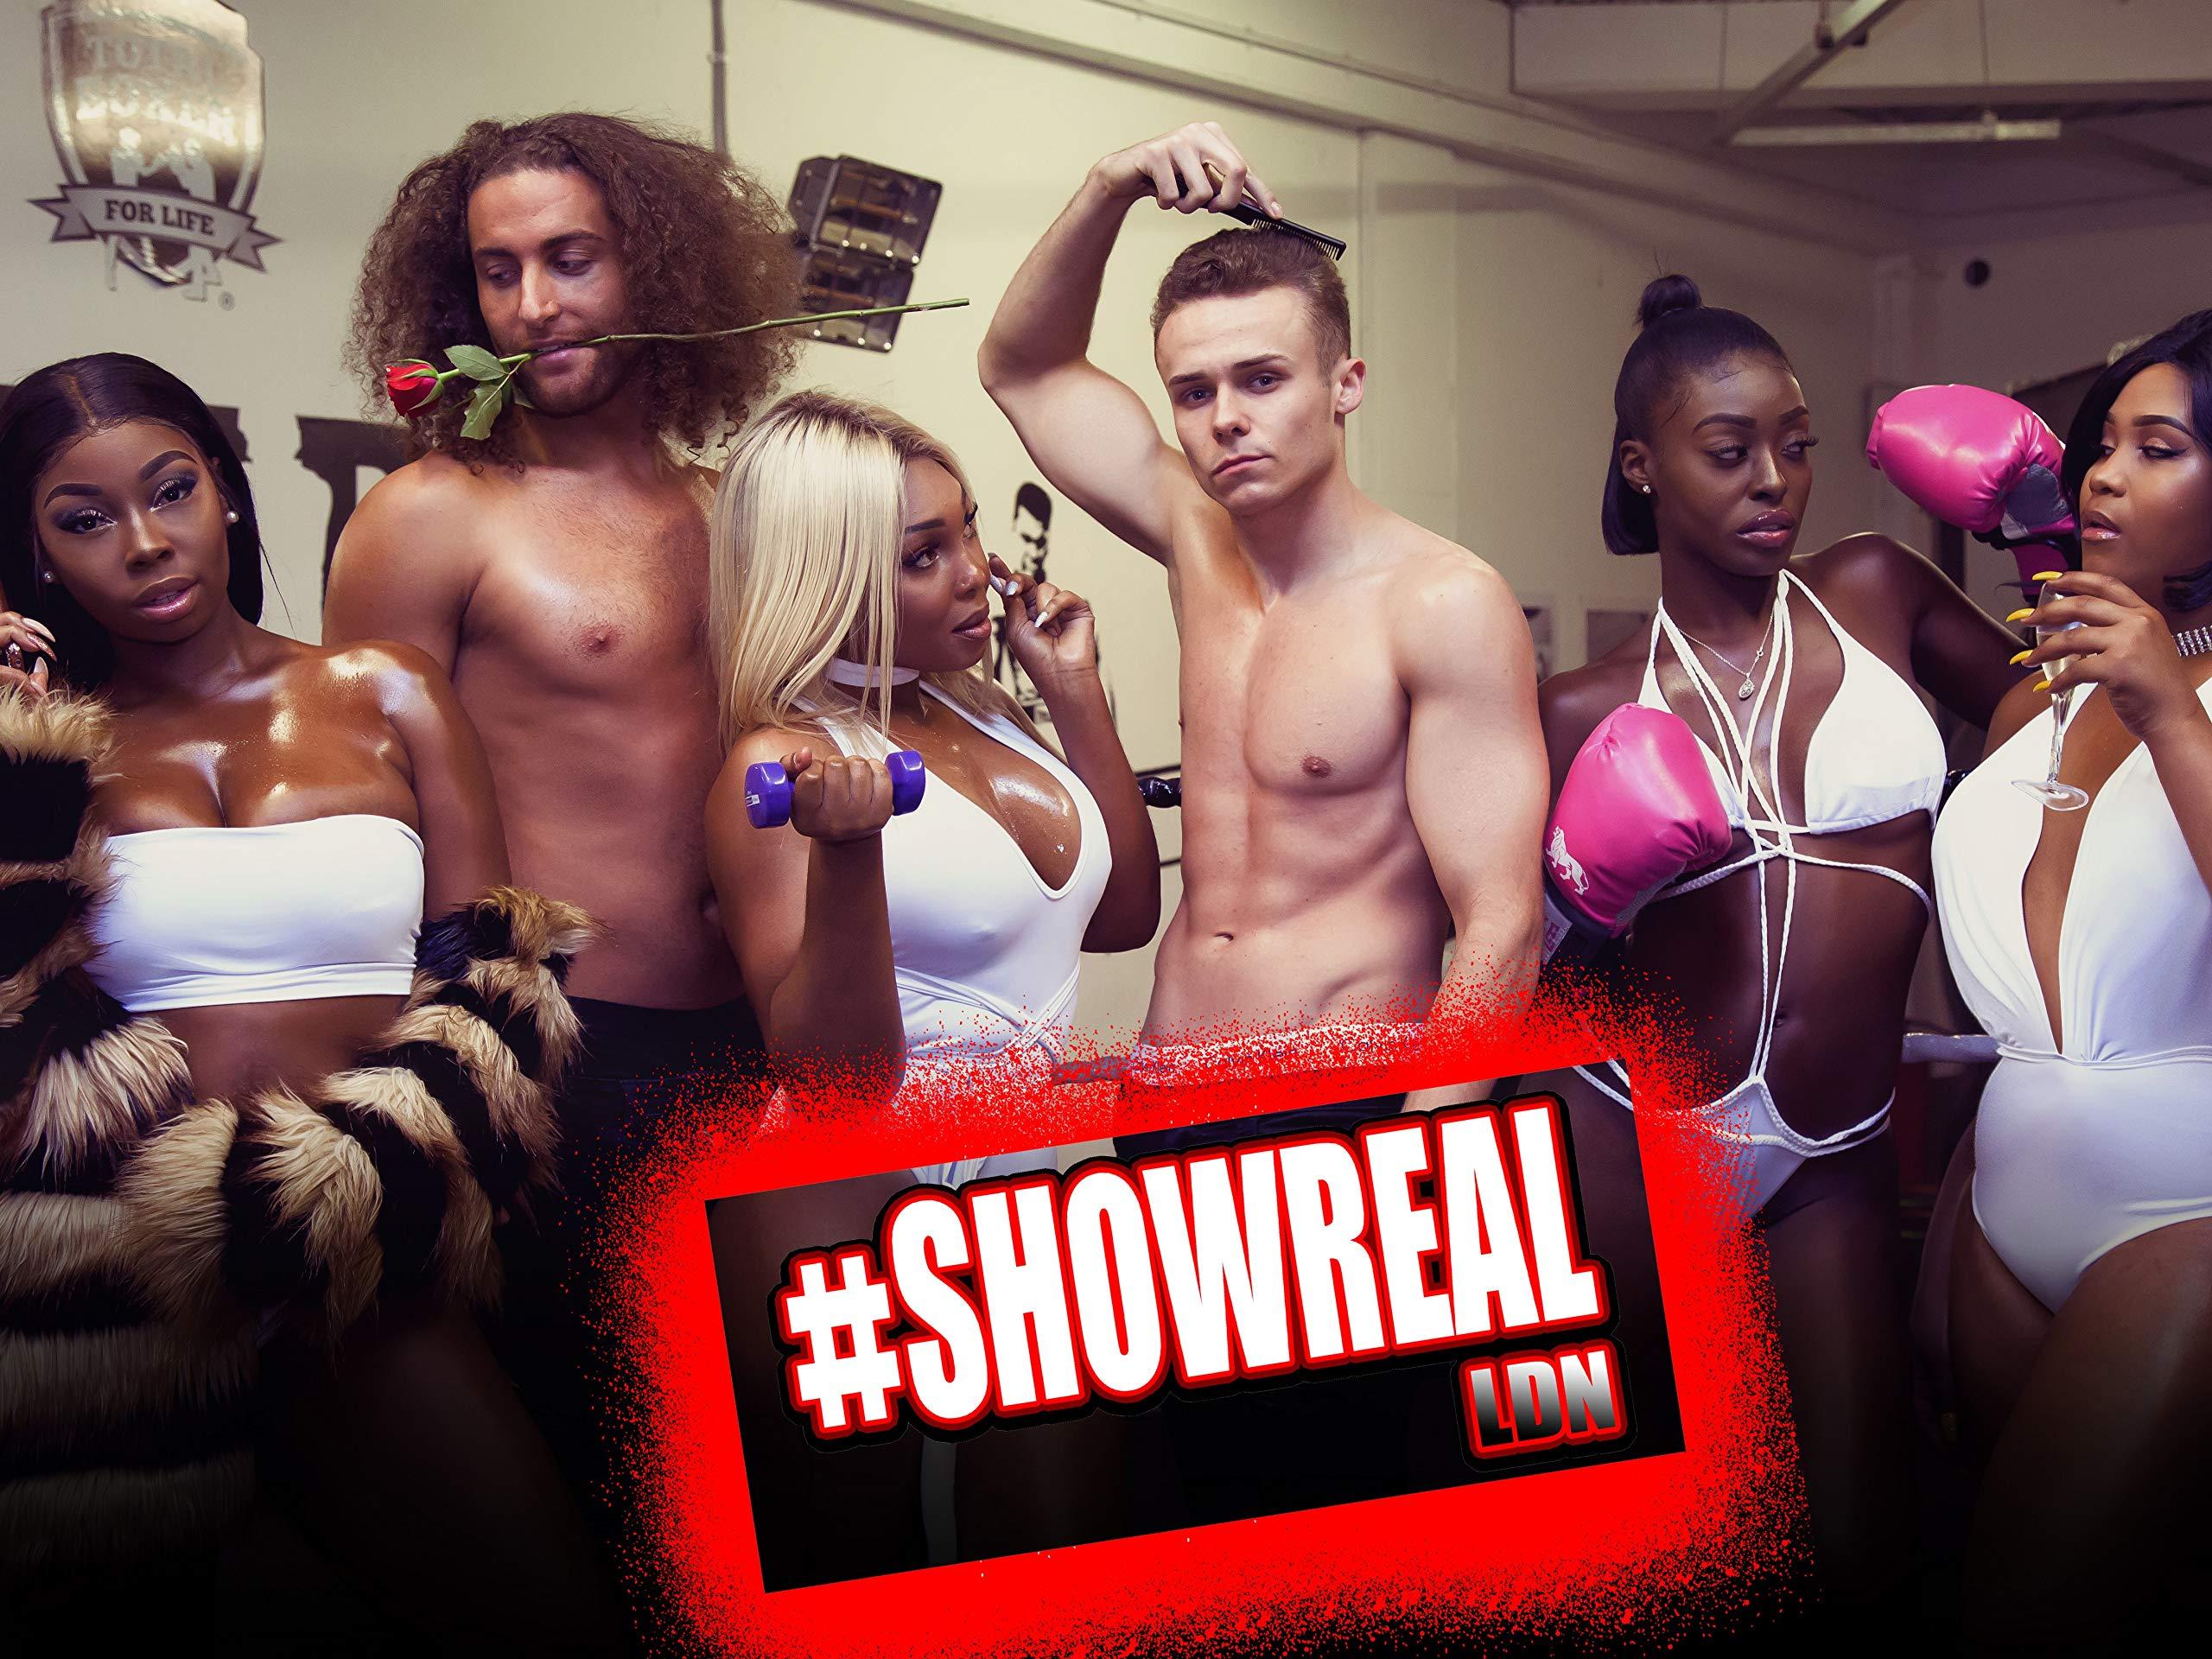 Showreal Ldn on Amazon Prime Instant Video UK